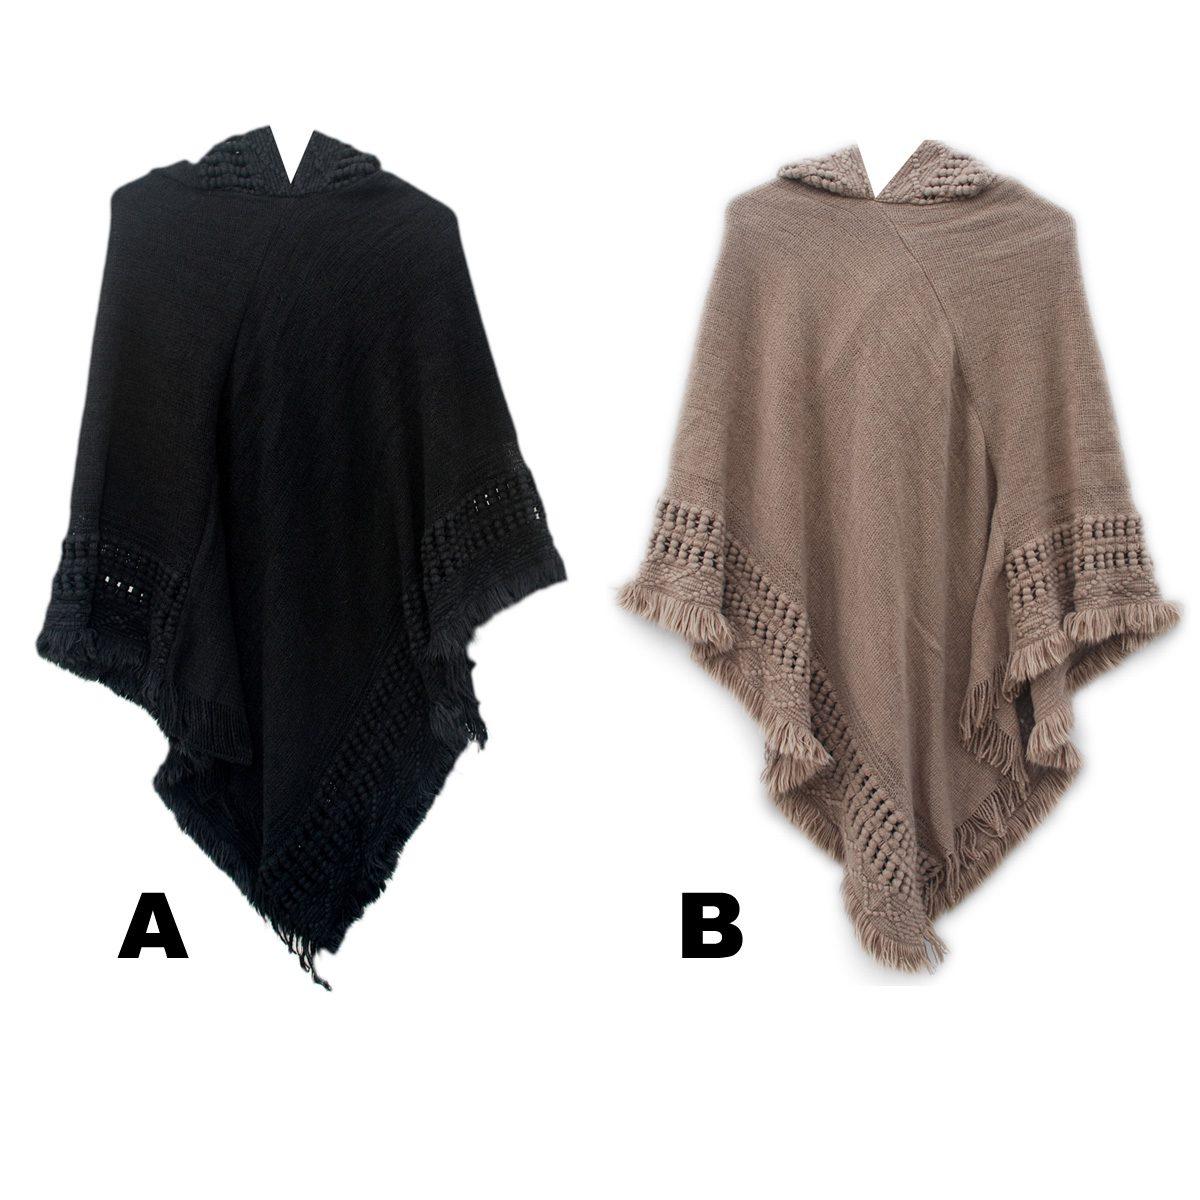 Mens Hooded Poncho Knitting Pattern : Women s Custom Knit Pattern Hooded Fashion Ponchos ...